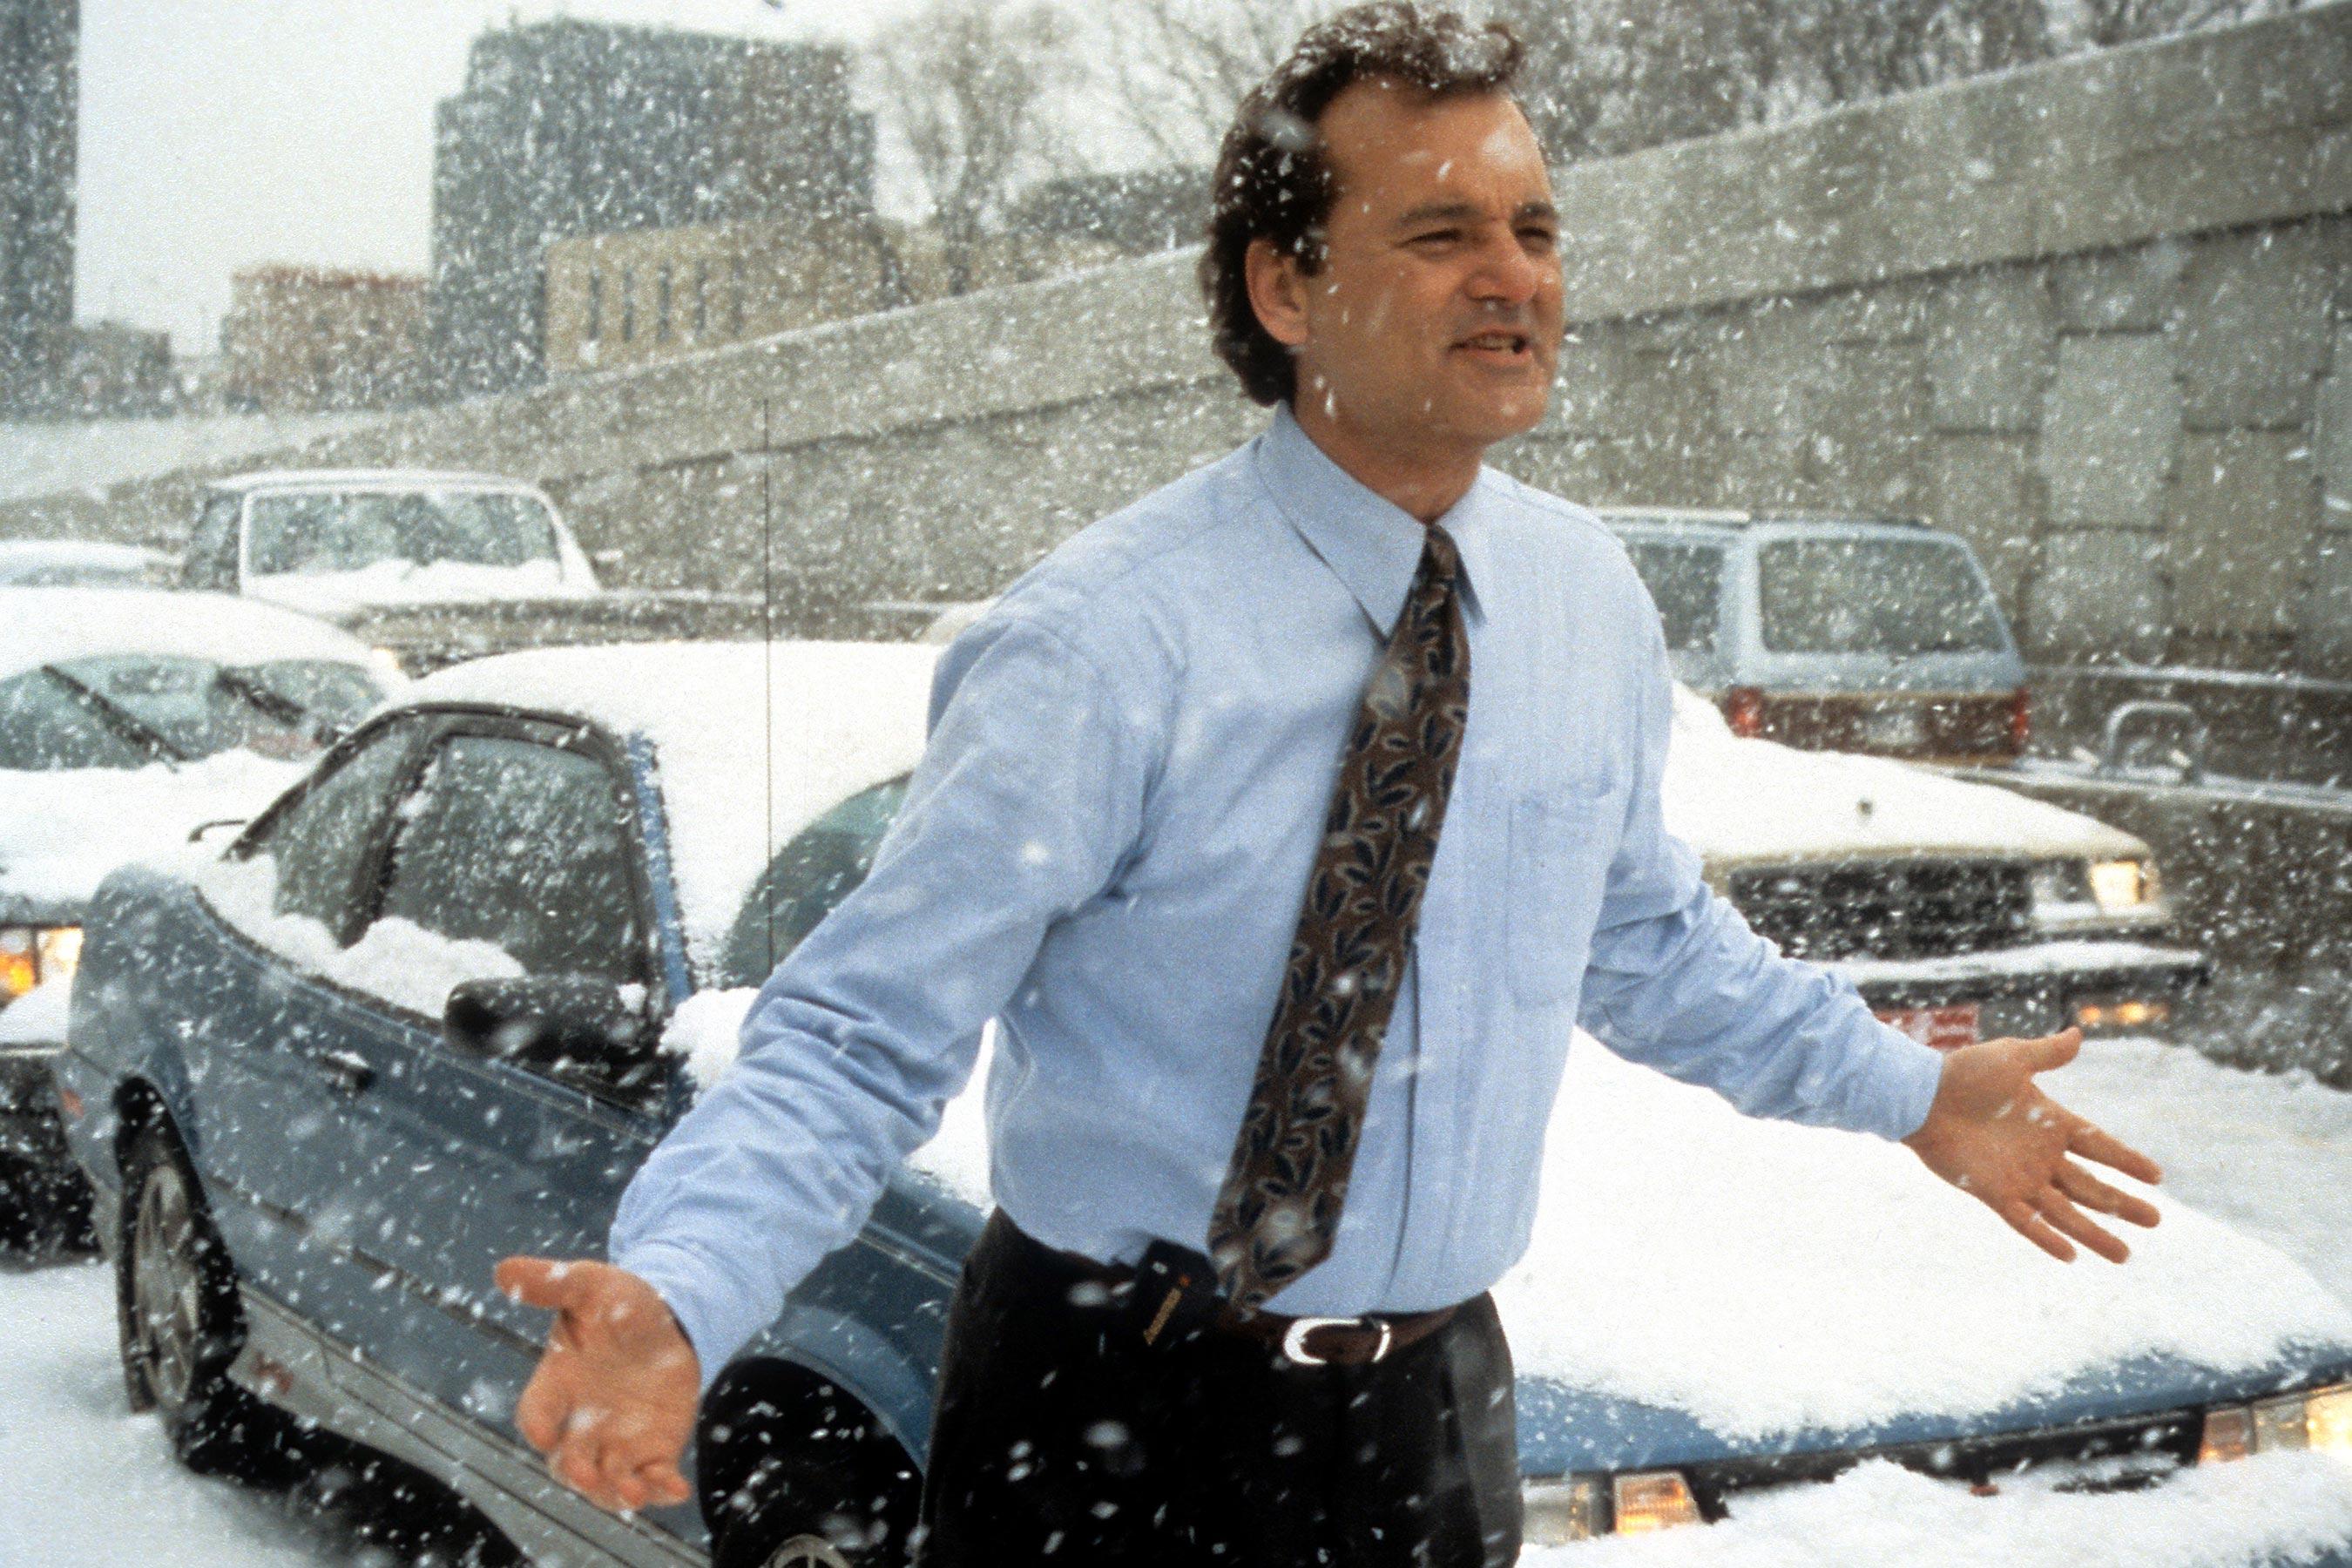 Bill Murray i Groundhog Day